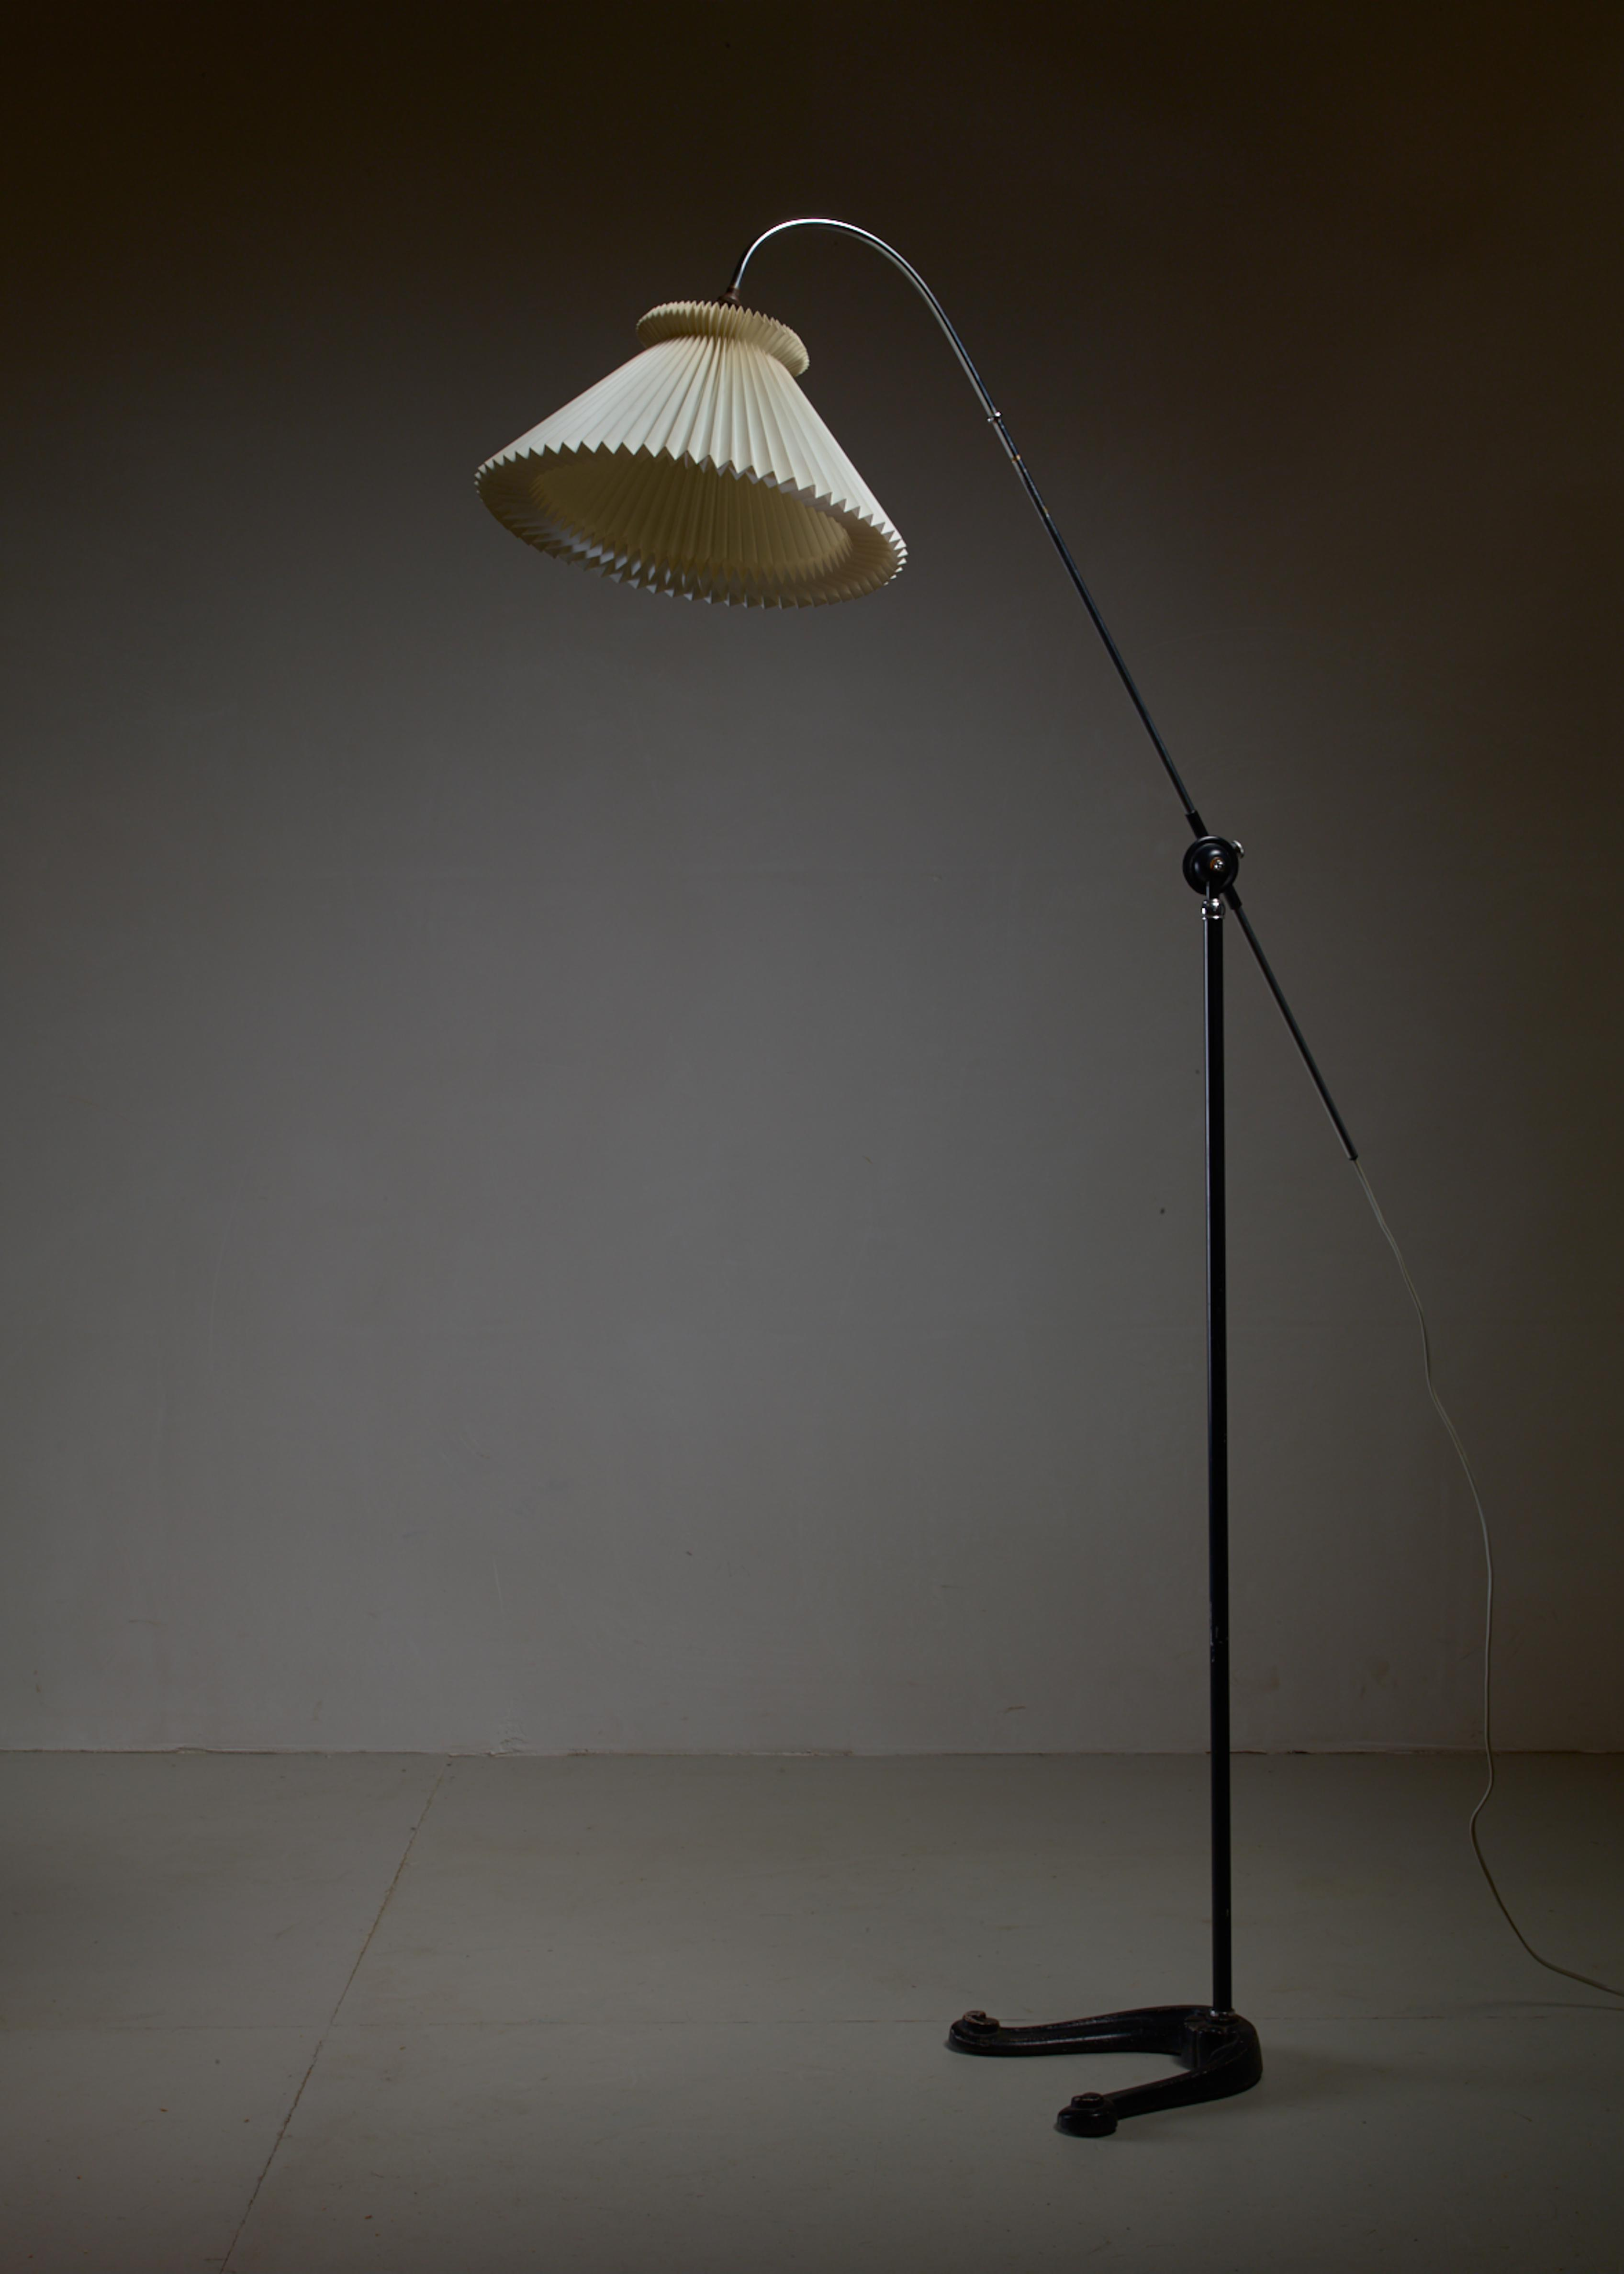 Captivating Fog U0026 Mørup Adjustable Metal Floor Lamp, Denmark, 1930s   Image 4 ... Ideas